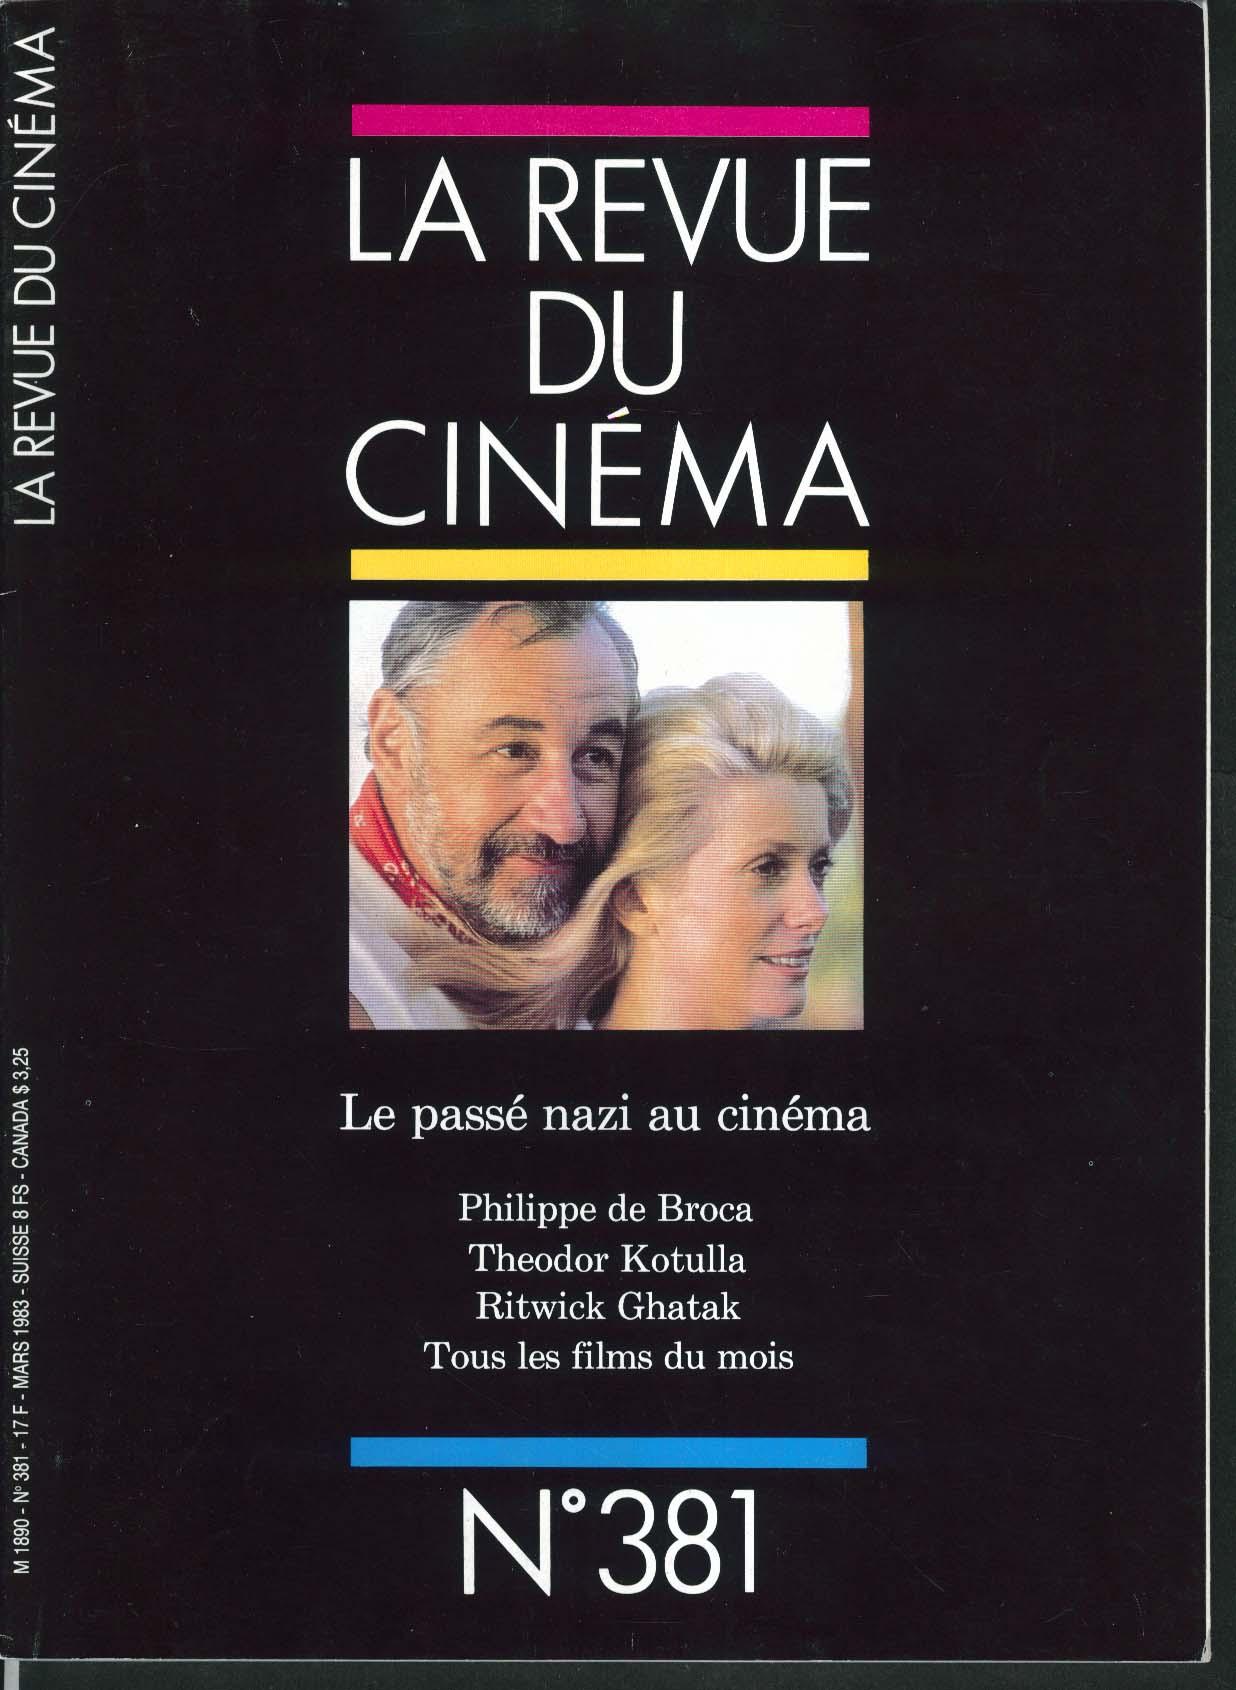 LA REVUE DU CINEMA #381 Philippe de Broca Theodor Kotulla Ritwick Ghatak 3 1983